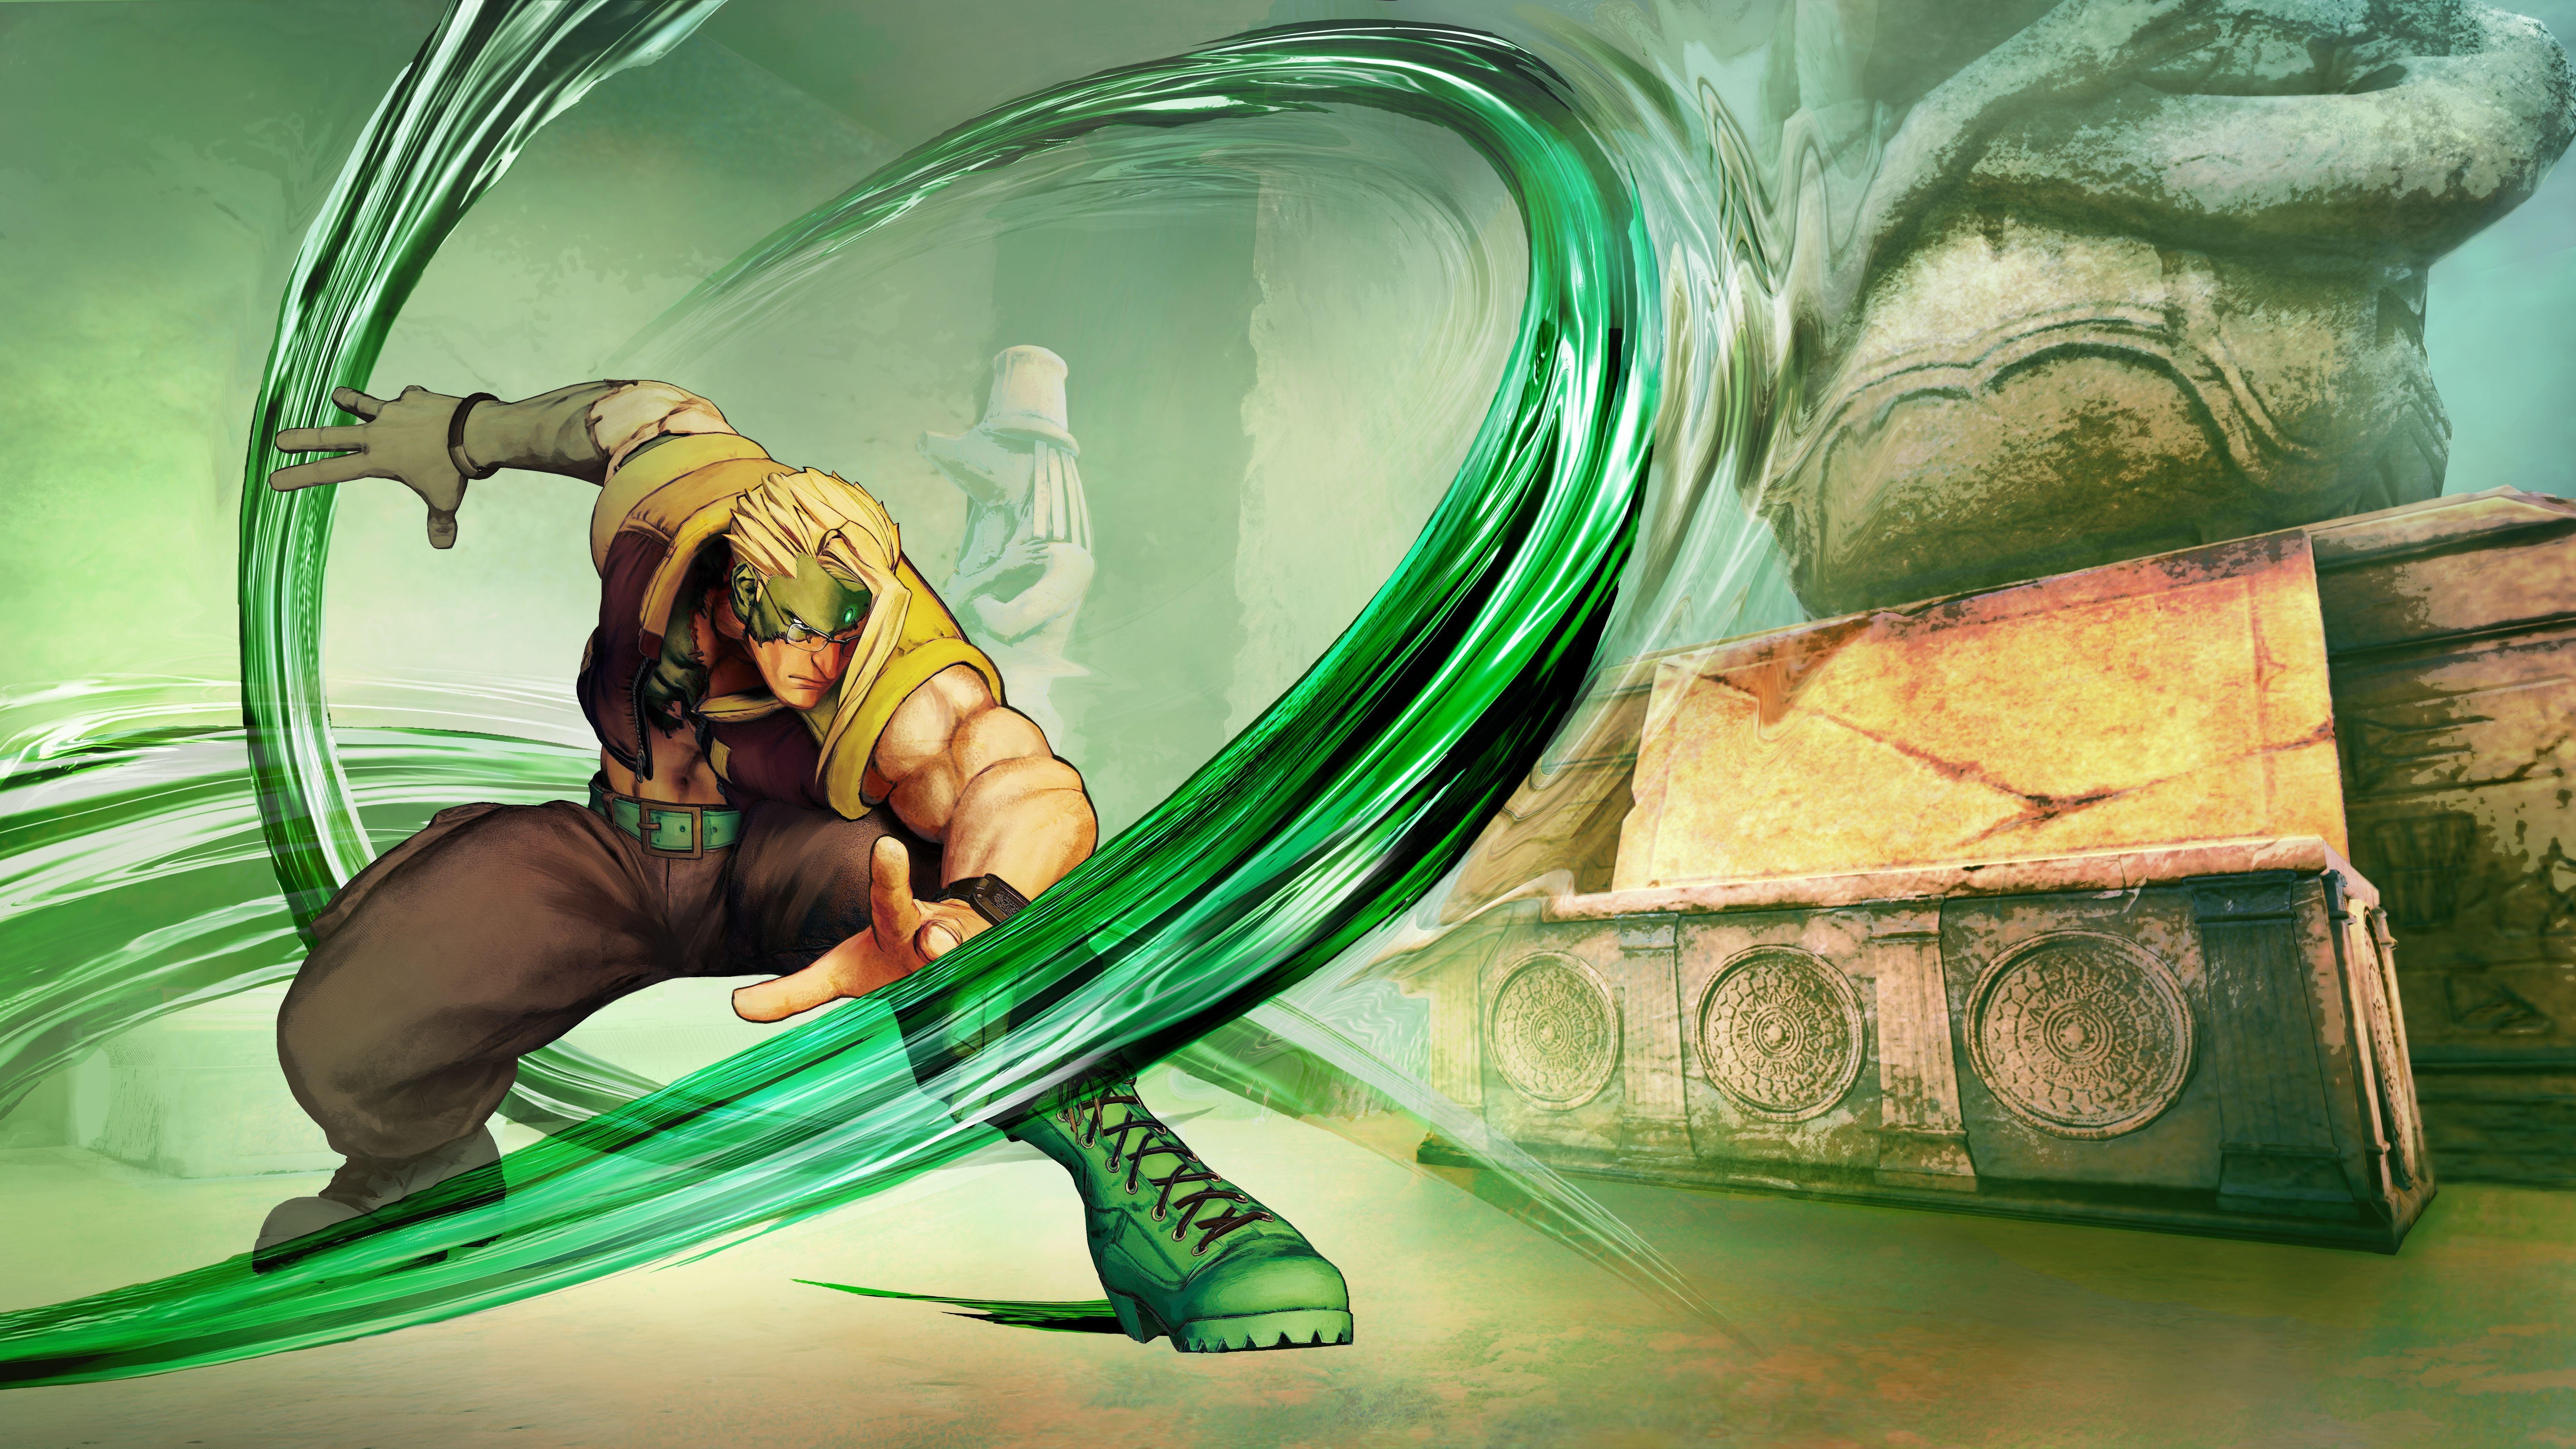 Street Fighter V Wallpapers Wallpaper Cave